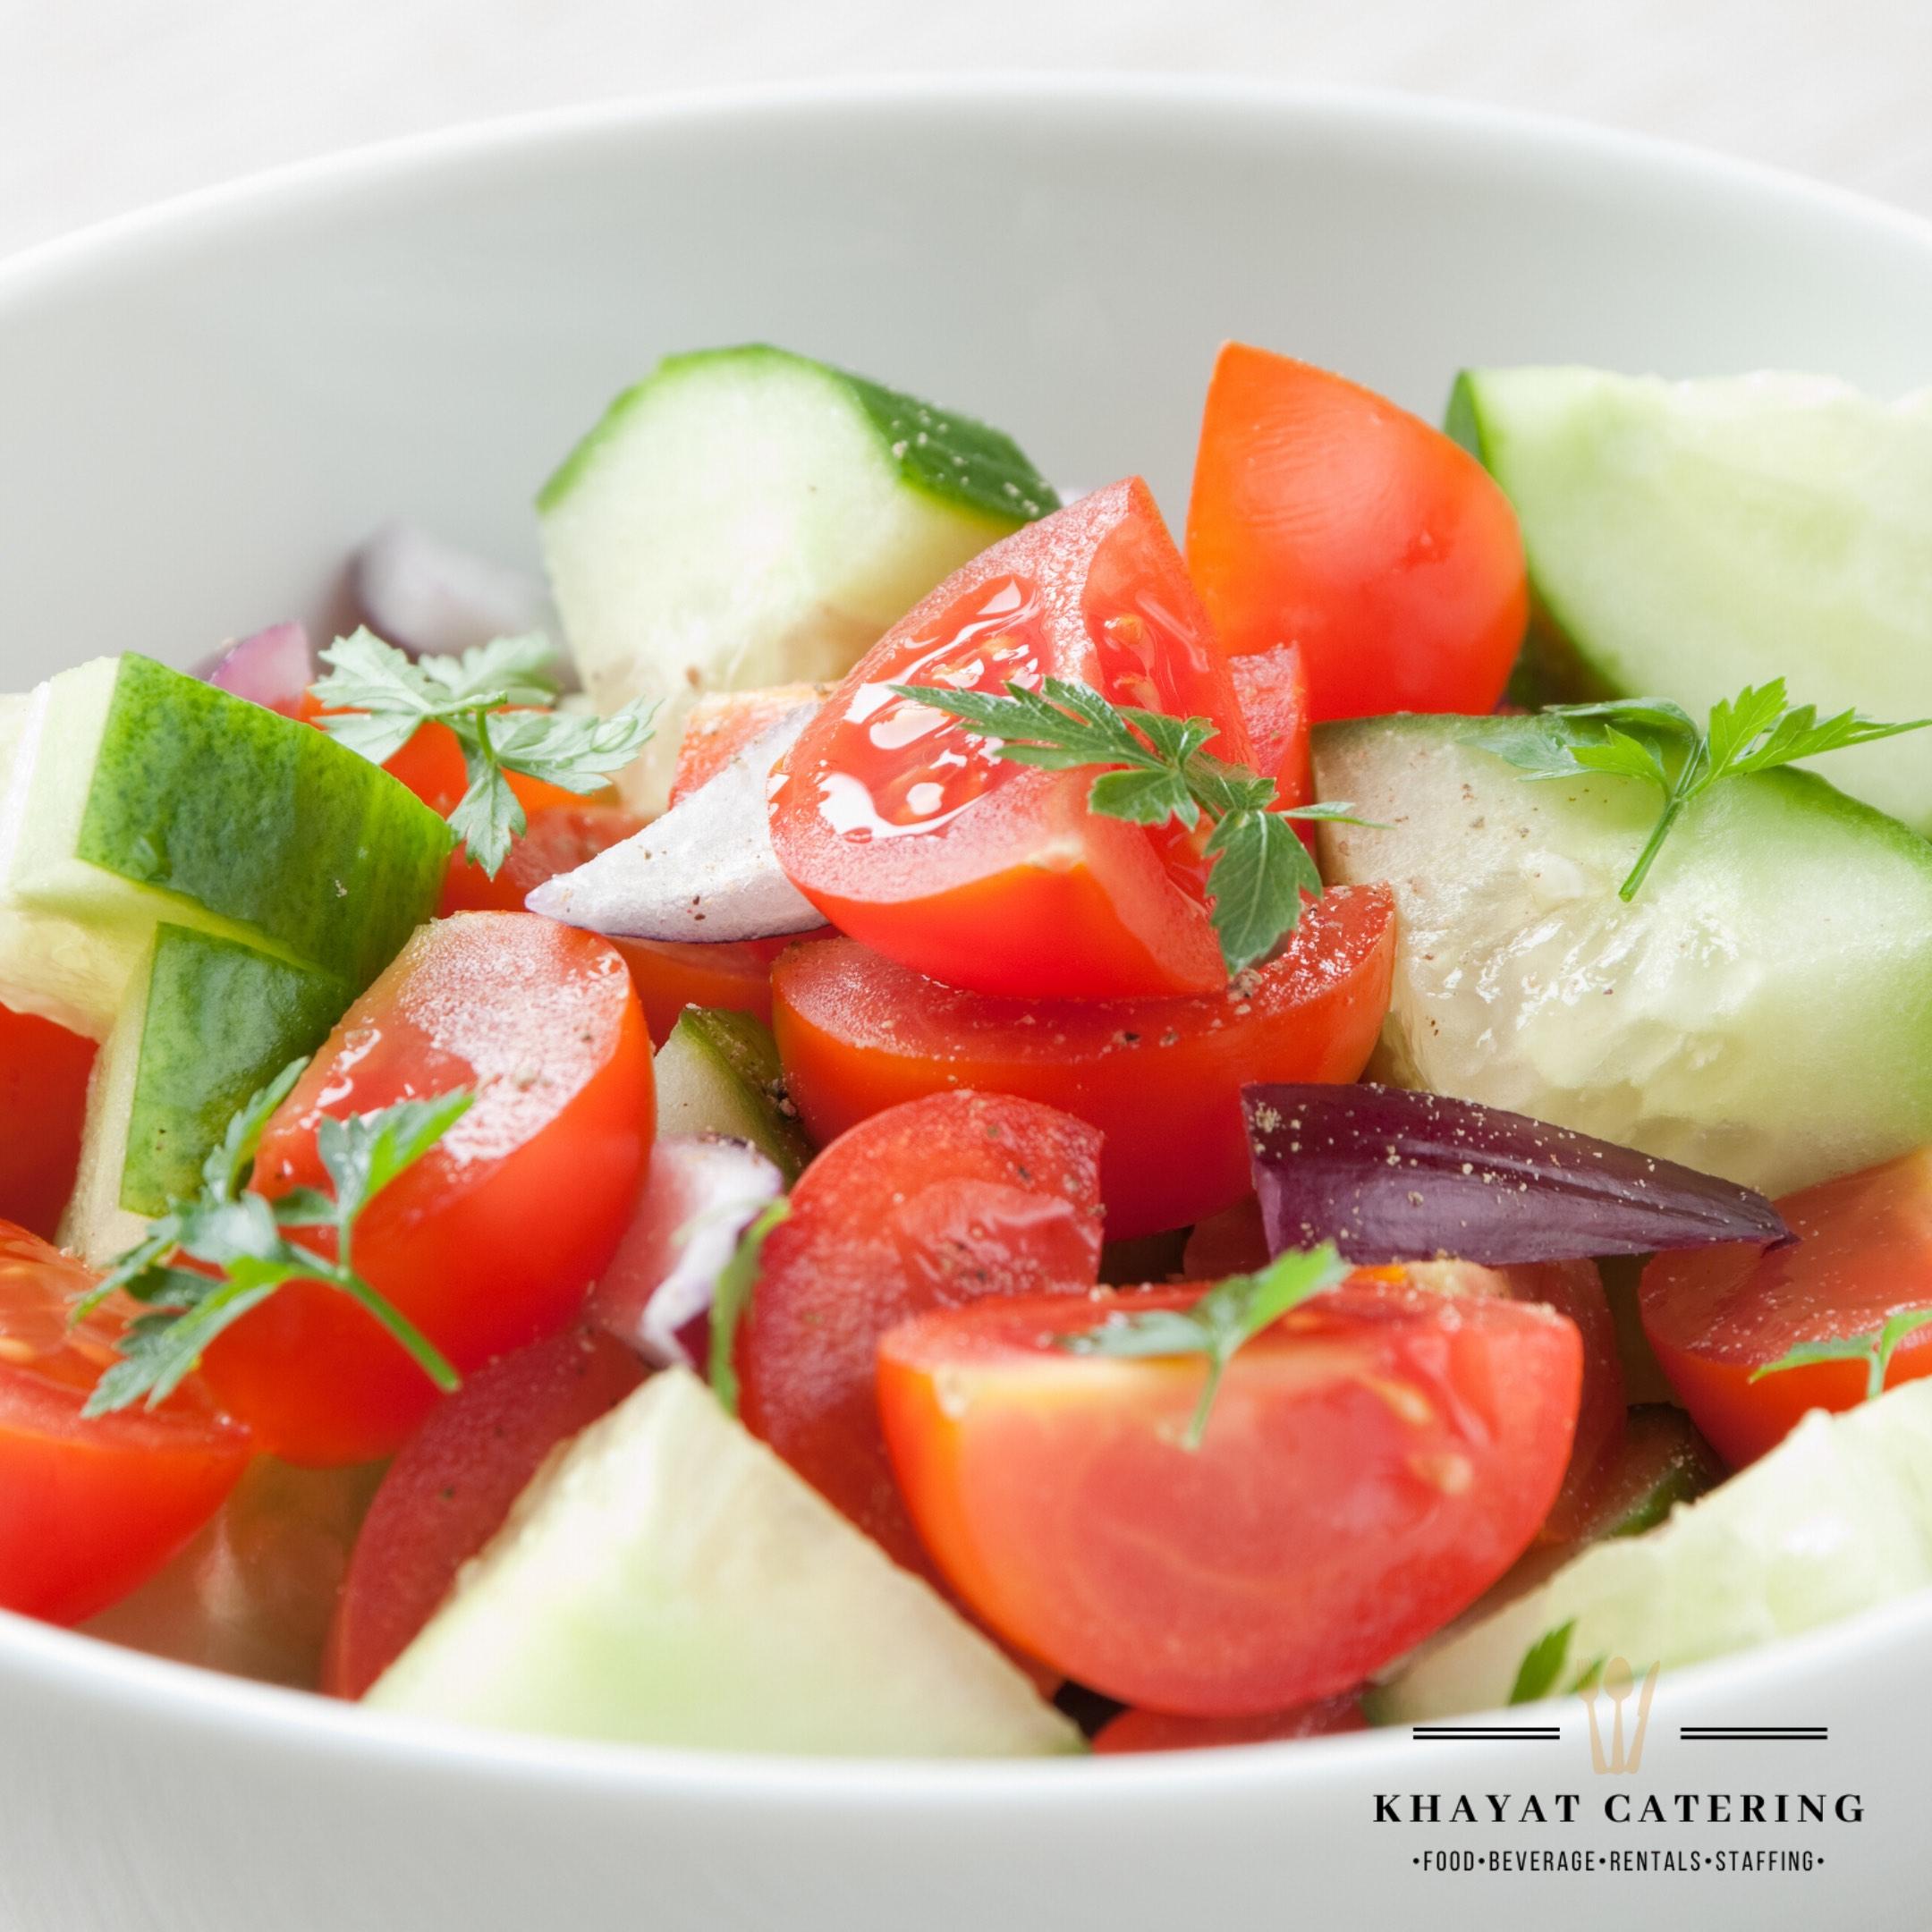 Khayat Catering tomato cucumber onion salad